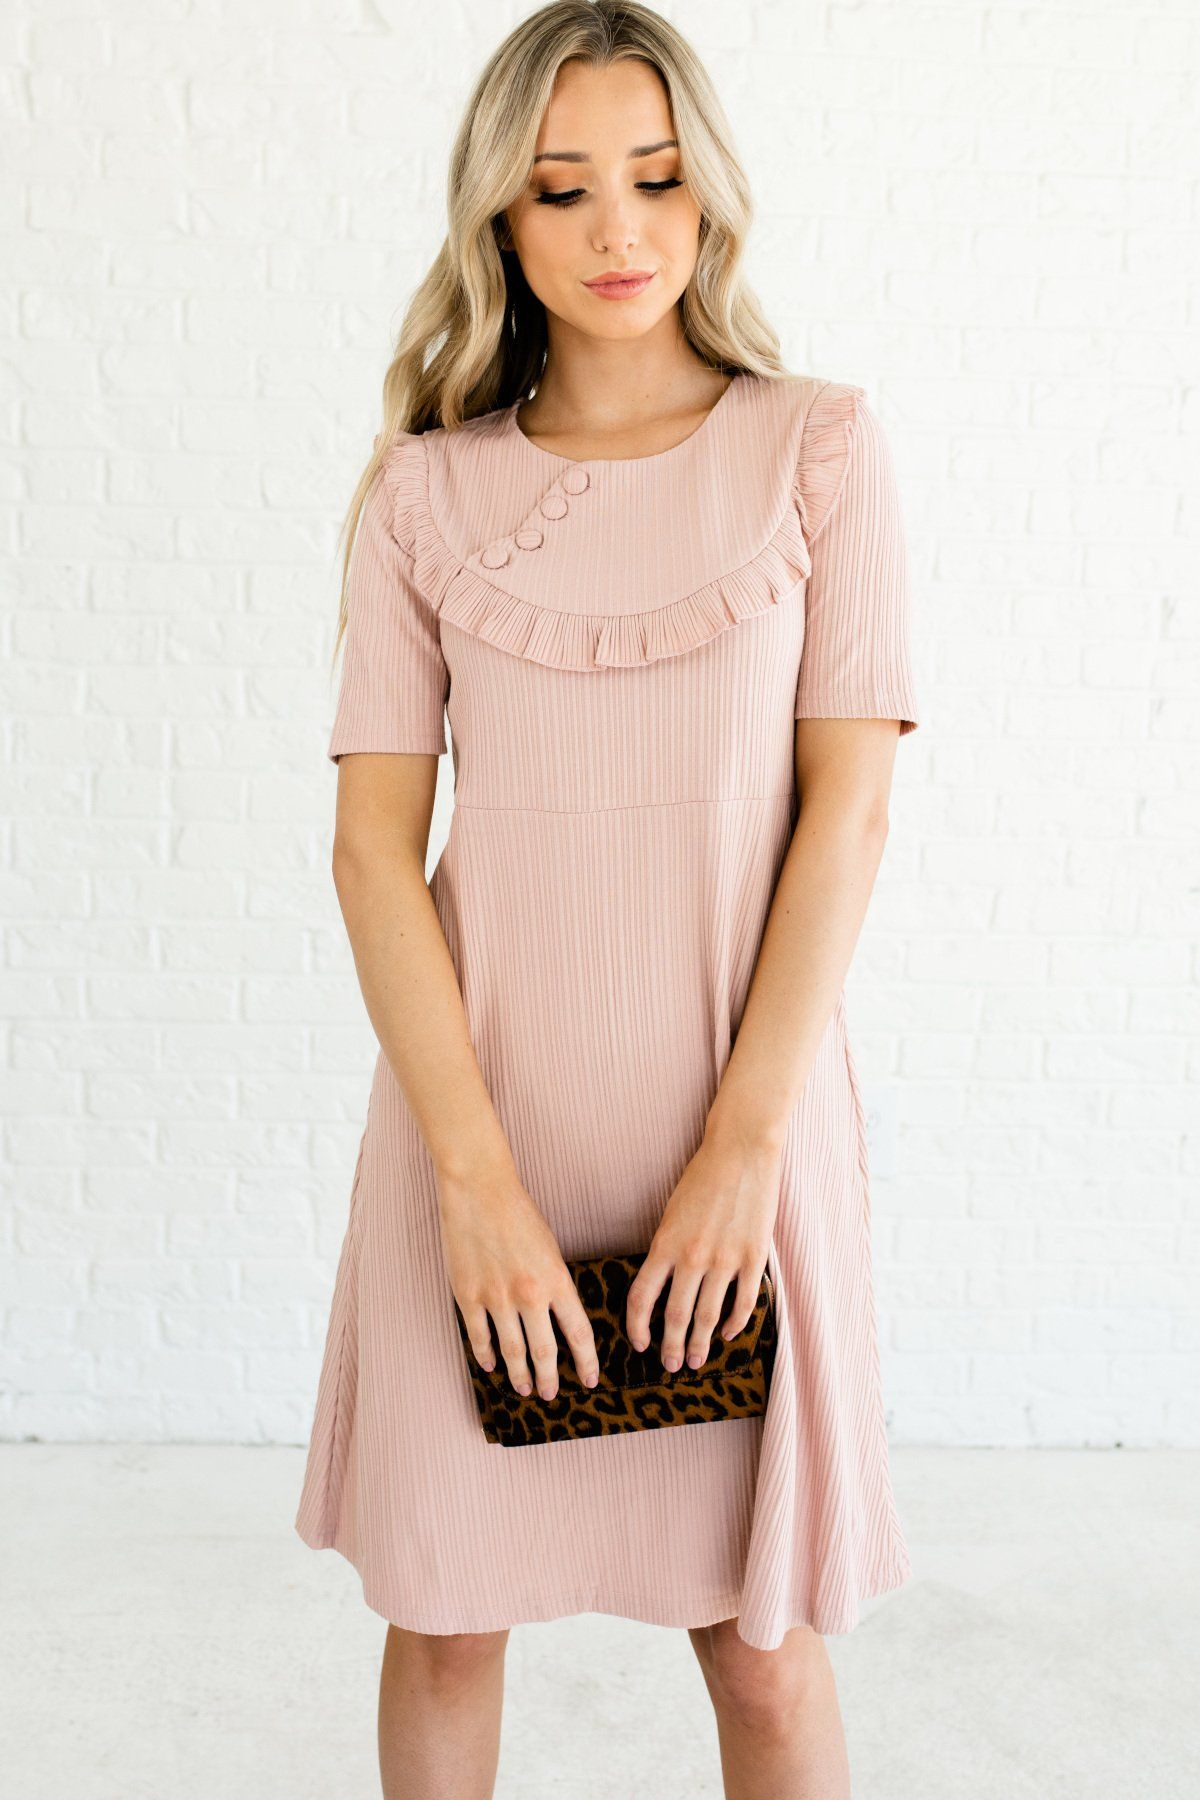 Be My Baby Blush Pink Knee Length Dress Pink Dress Casual Dresses Knee Length Dress